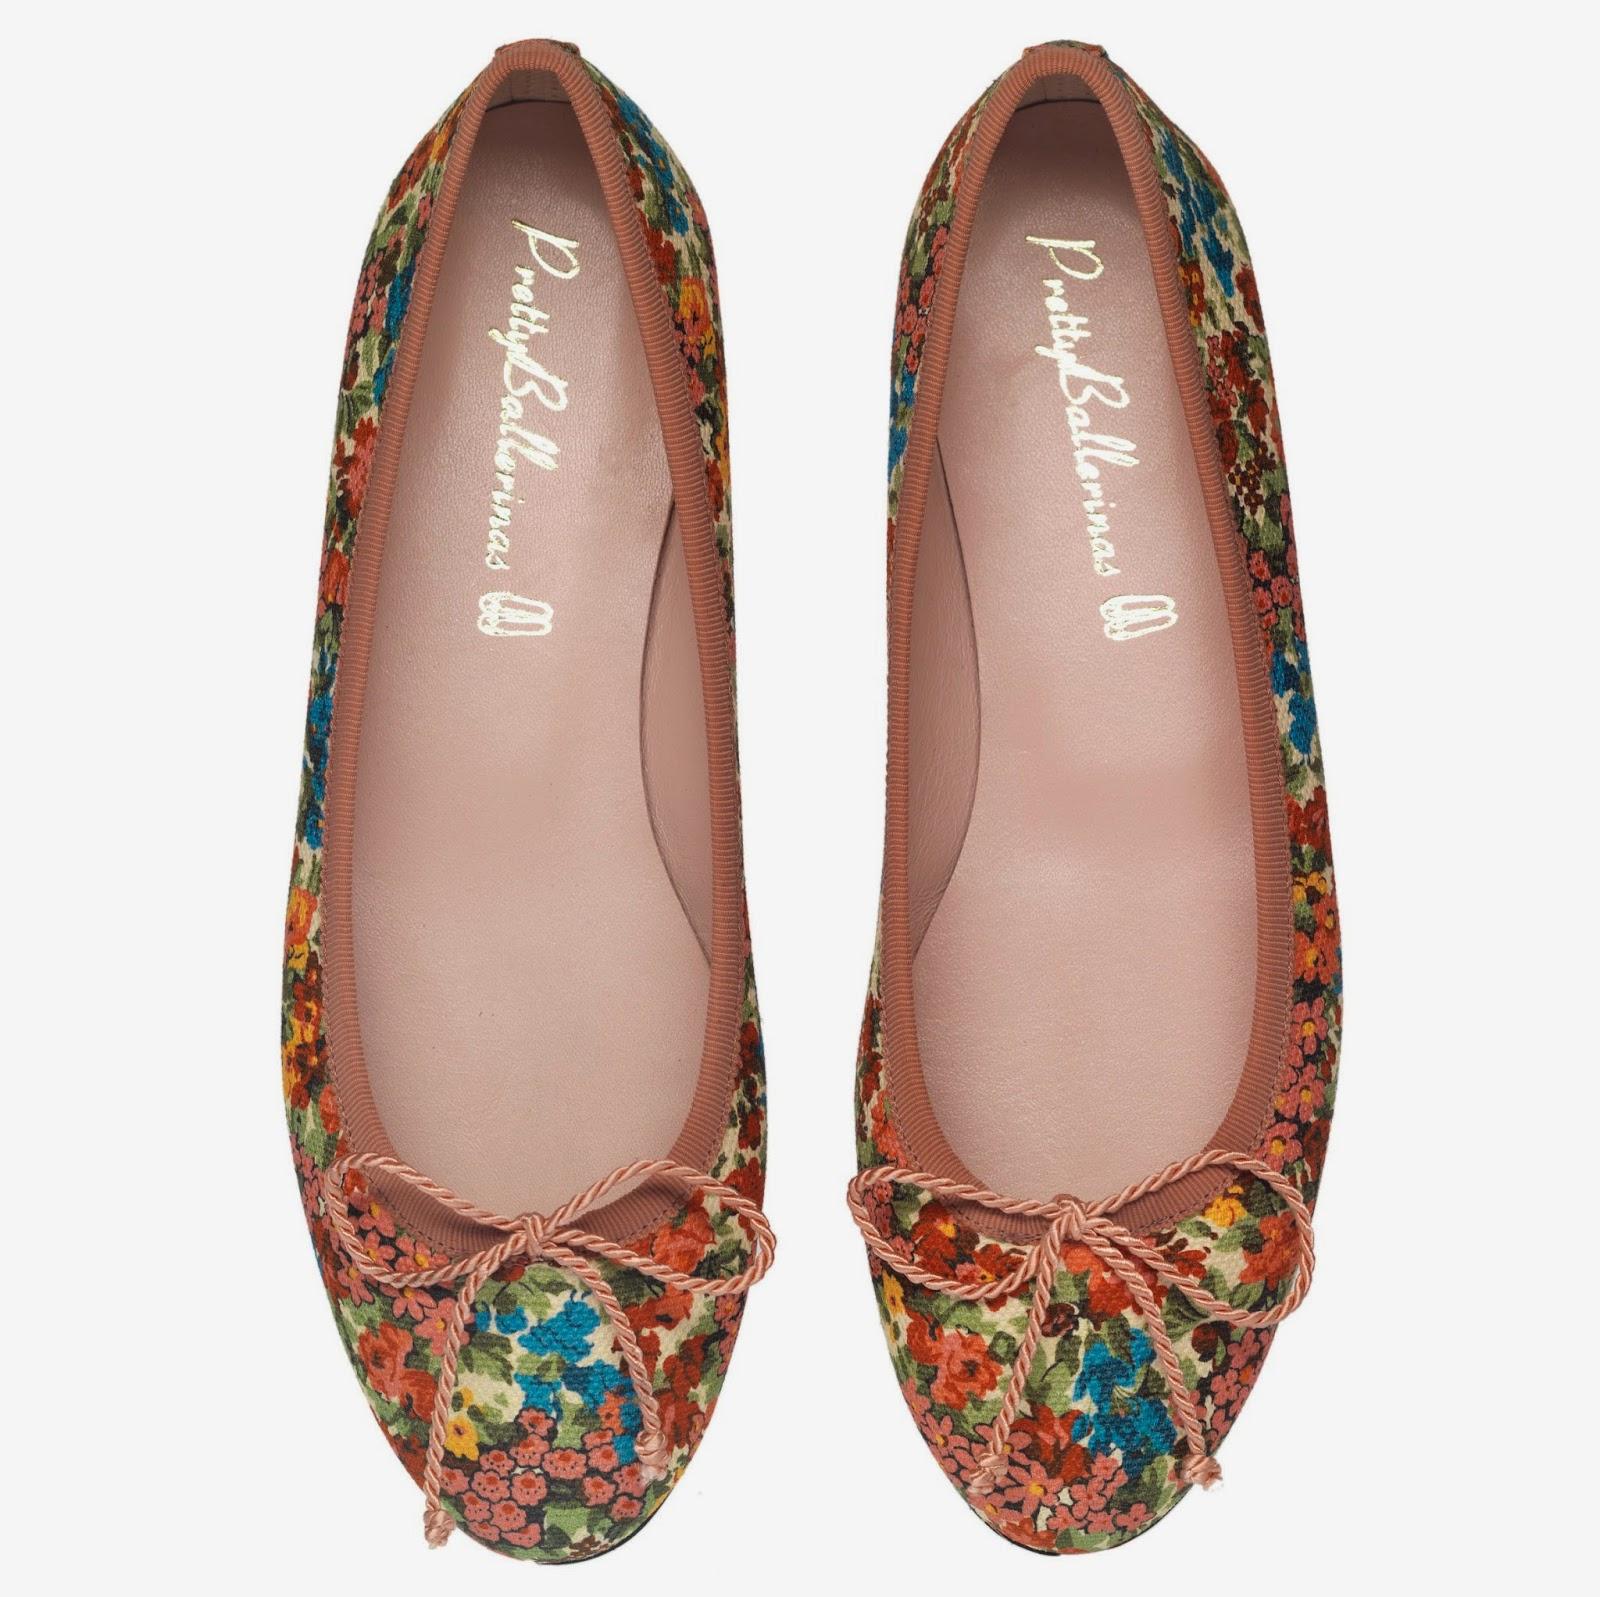 Pretty Ballerinas, Olivia Palermo, Blog de Moda, Marilyn Flowery Textile